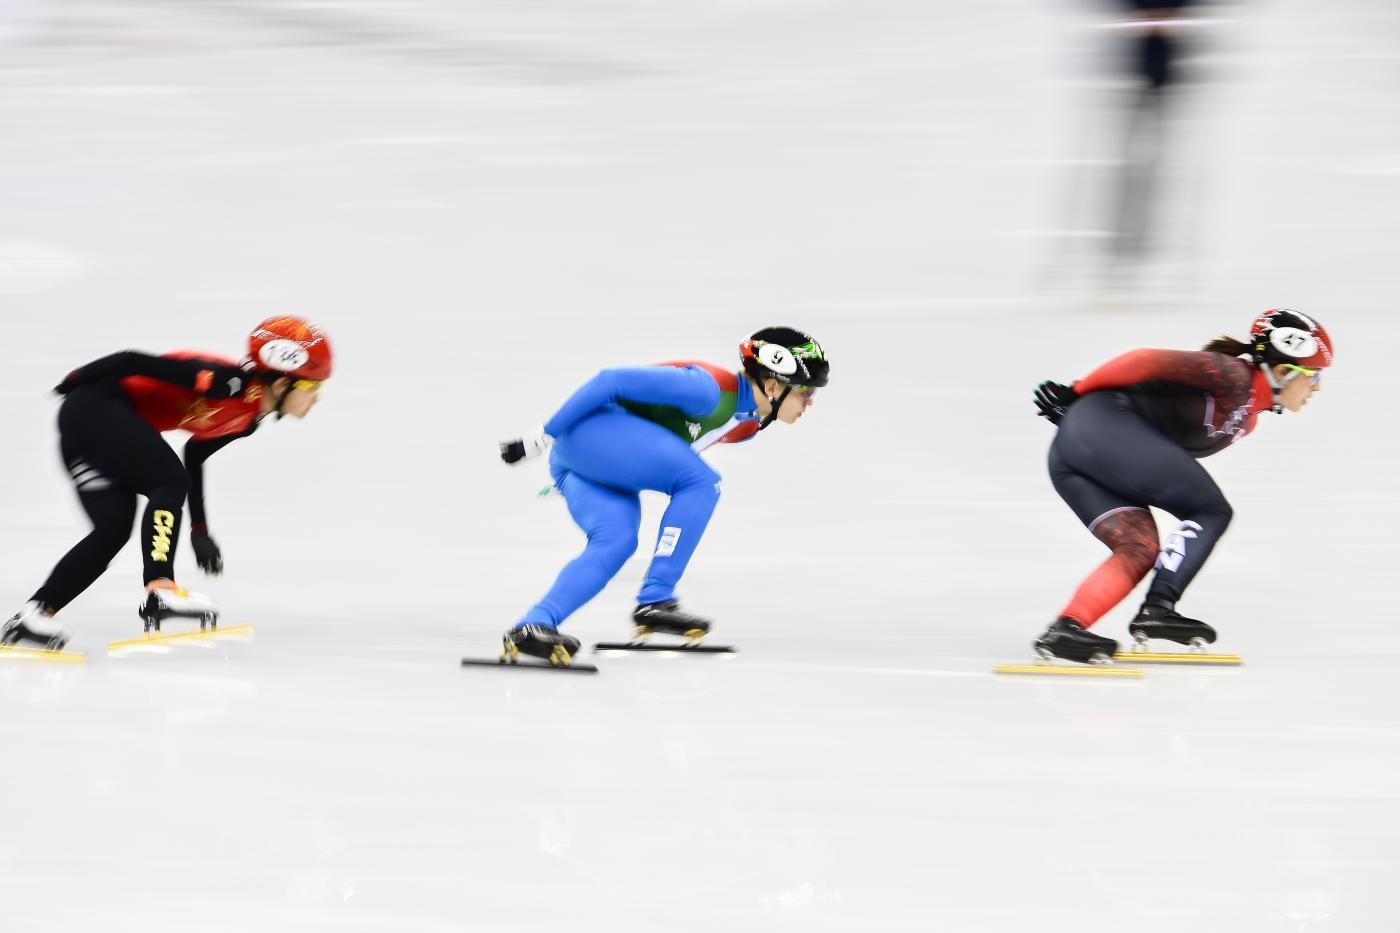 Olimpiadi PyeongChang, Arianna Fontana bronzo nei 1000 m